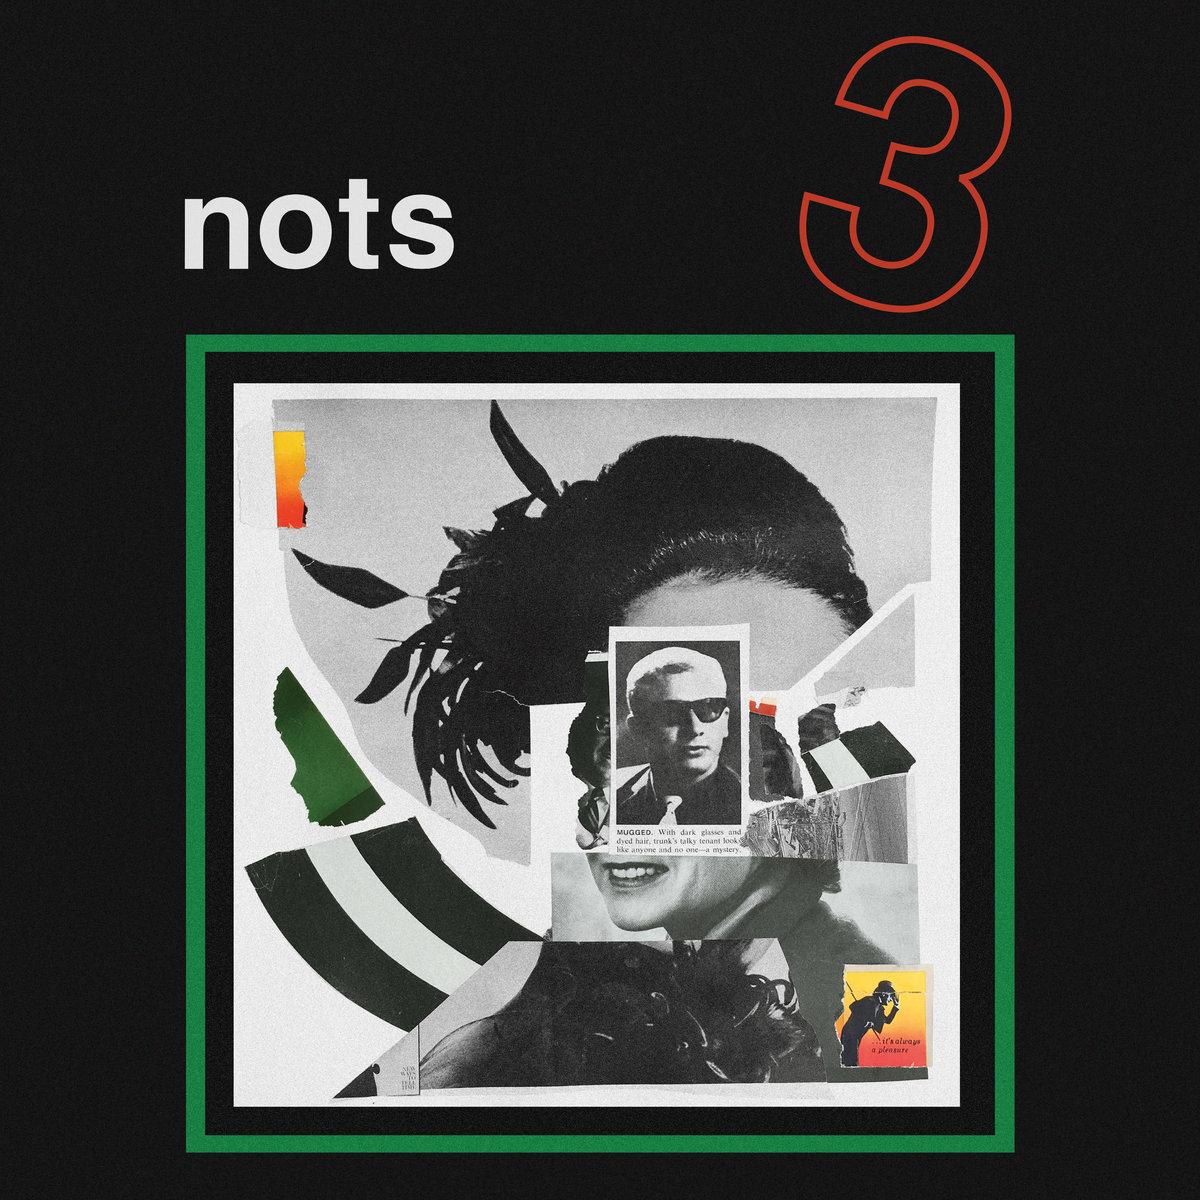 NOTS - 3 (LP)